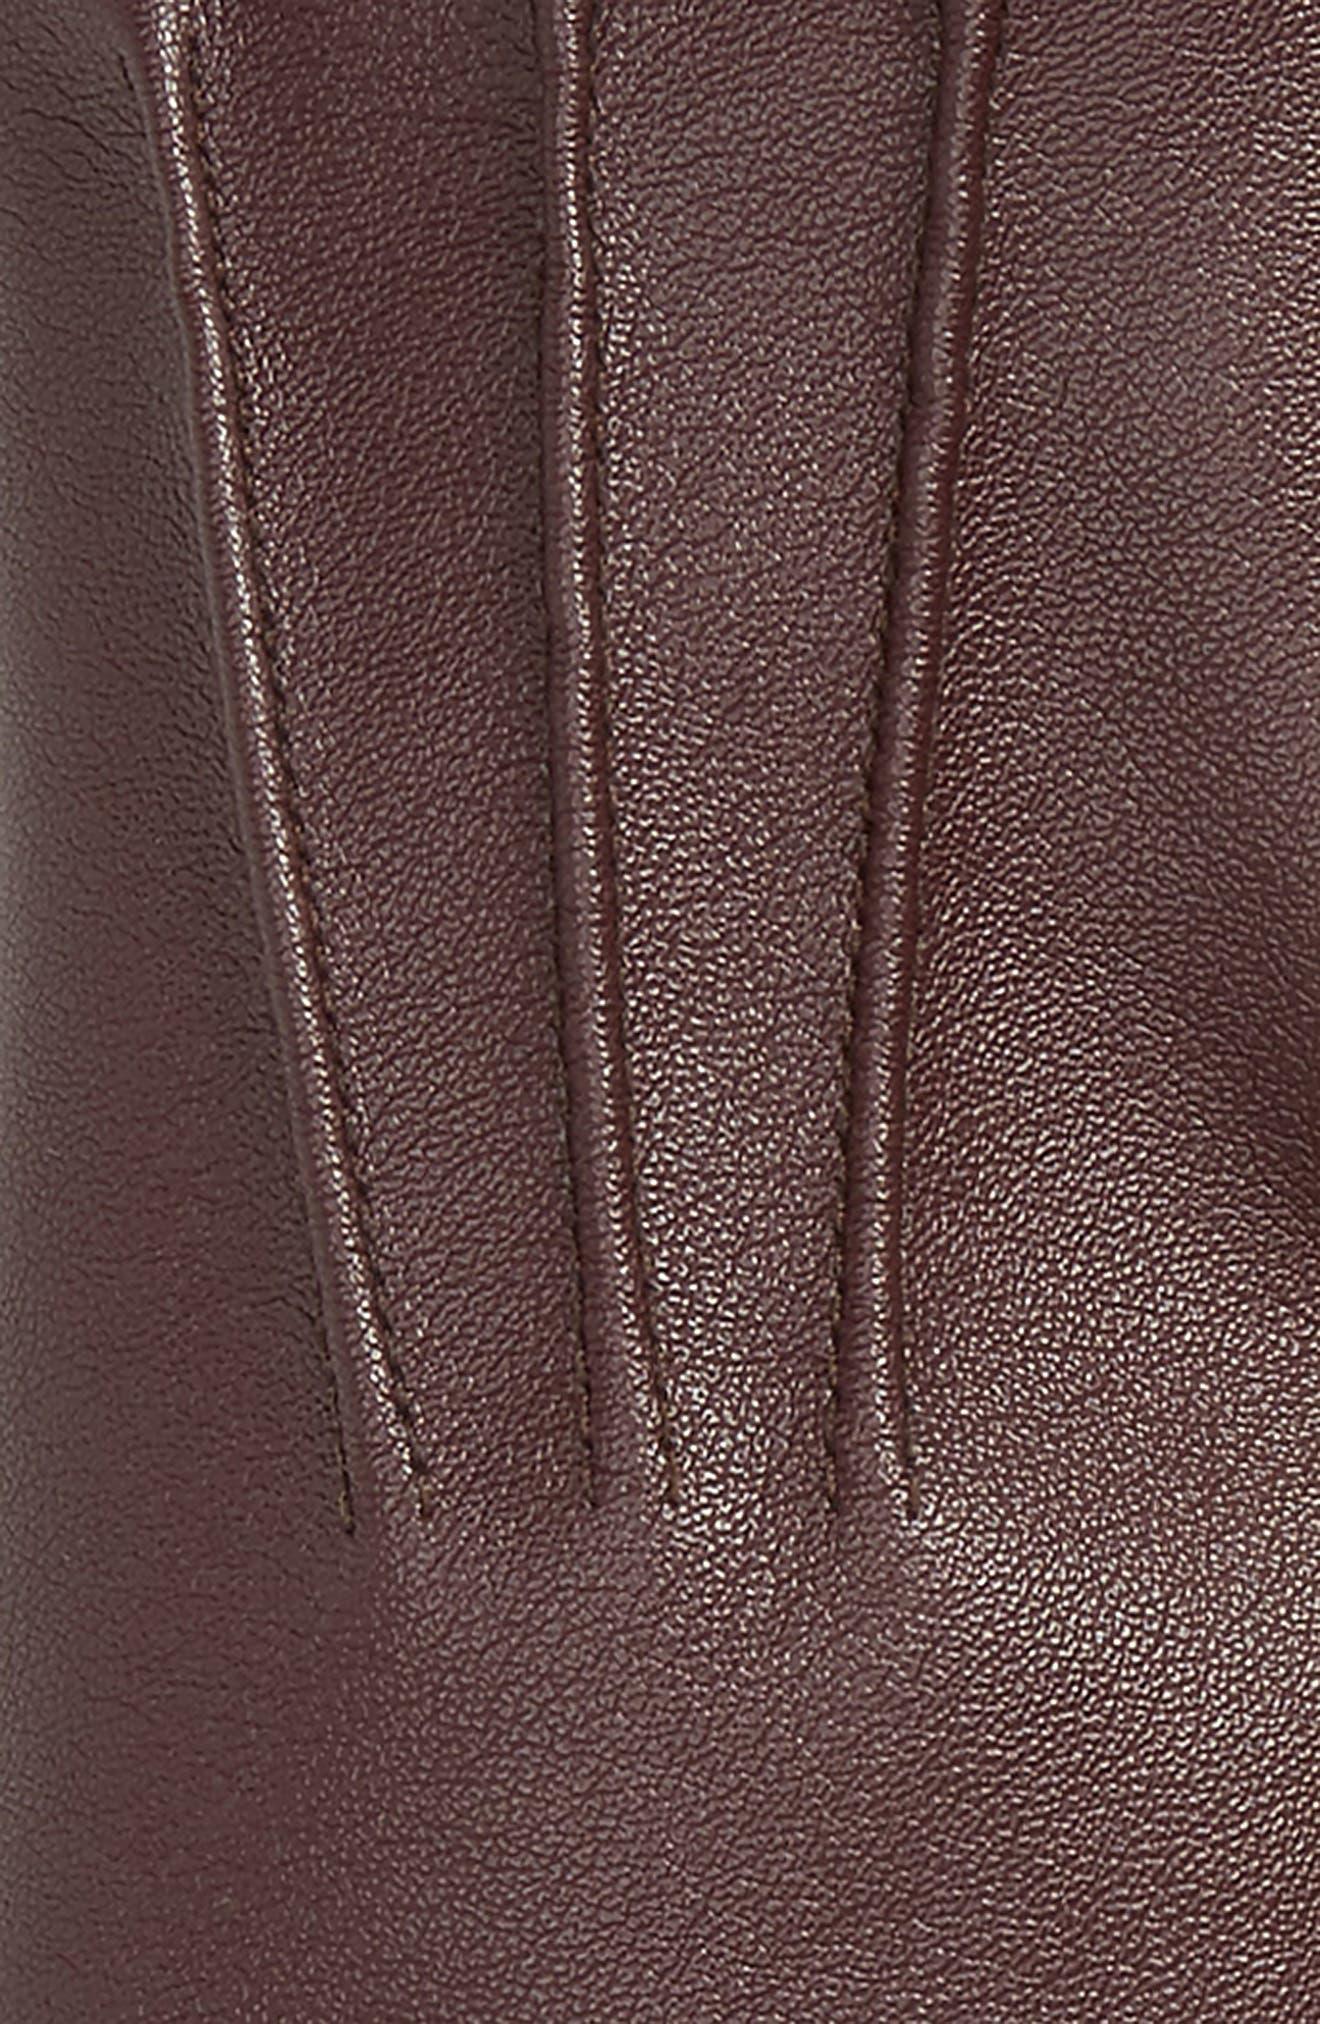 Faux Leather Gloves,                             Alternate thumbnail 8, color,